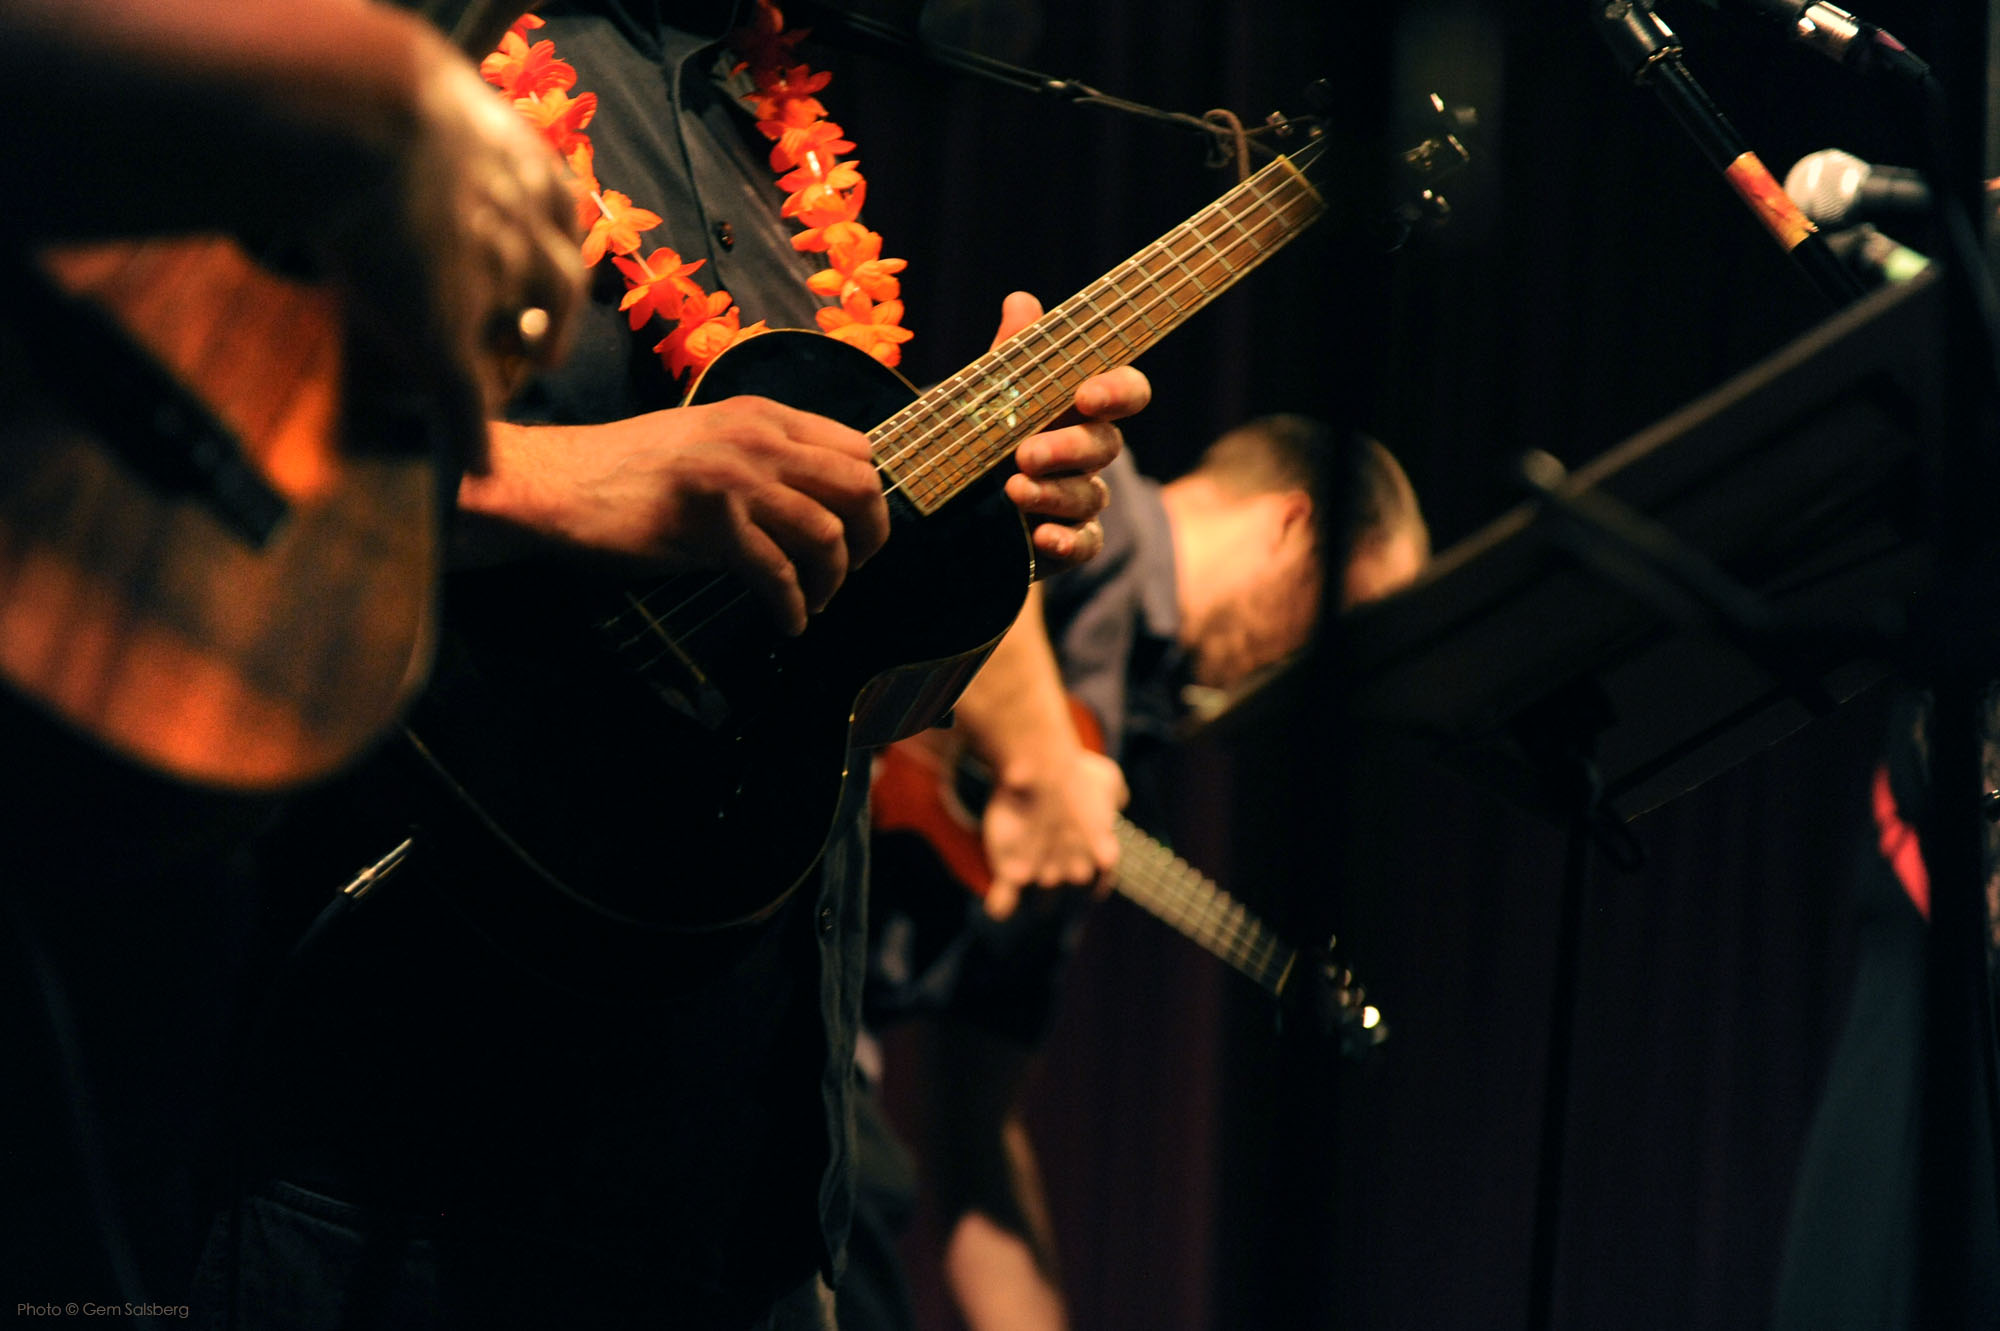 Vancouver_Uke_Concert_2013_Gem_Salsberg_Photography_4531.jpg